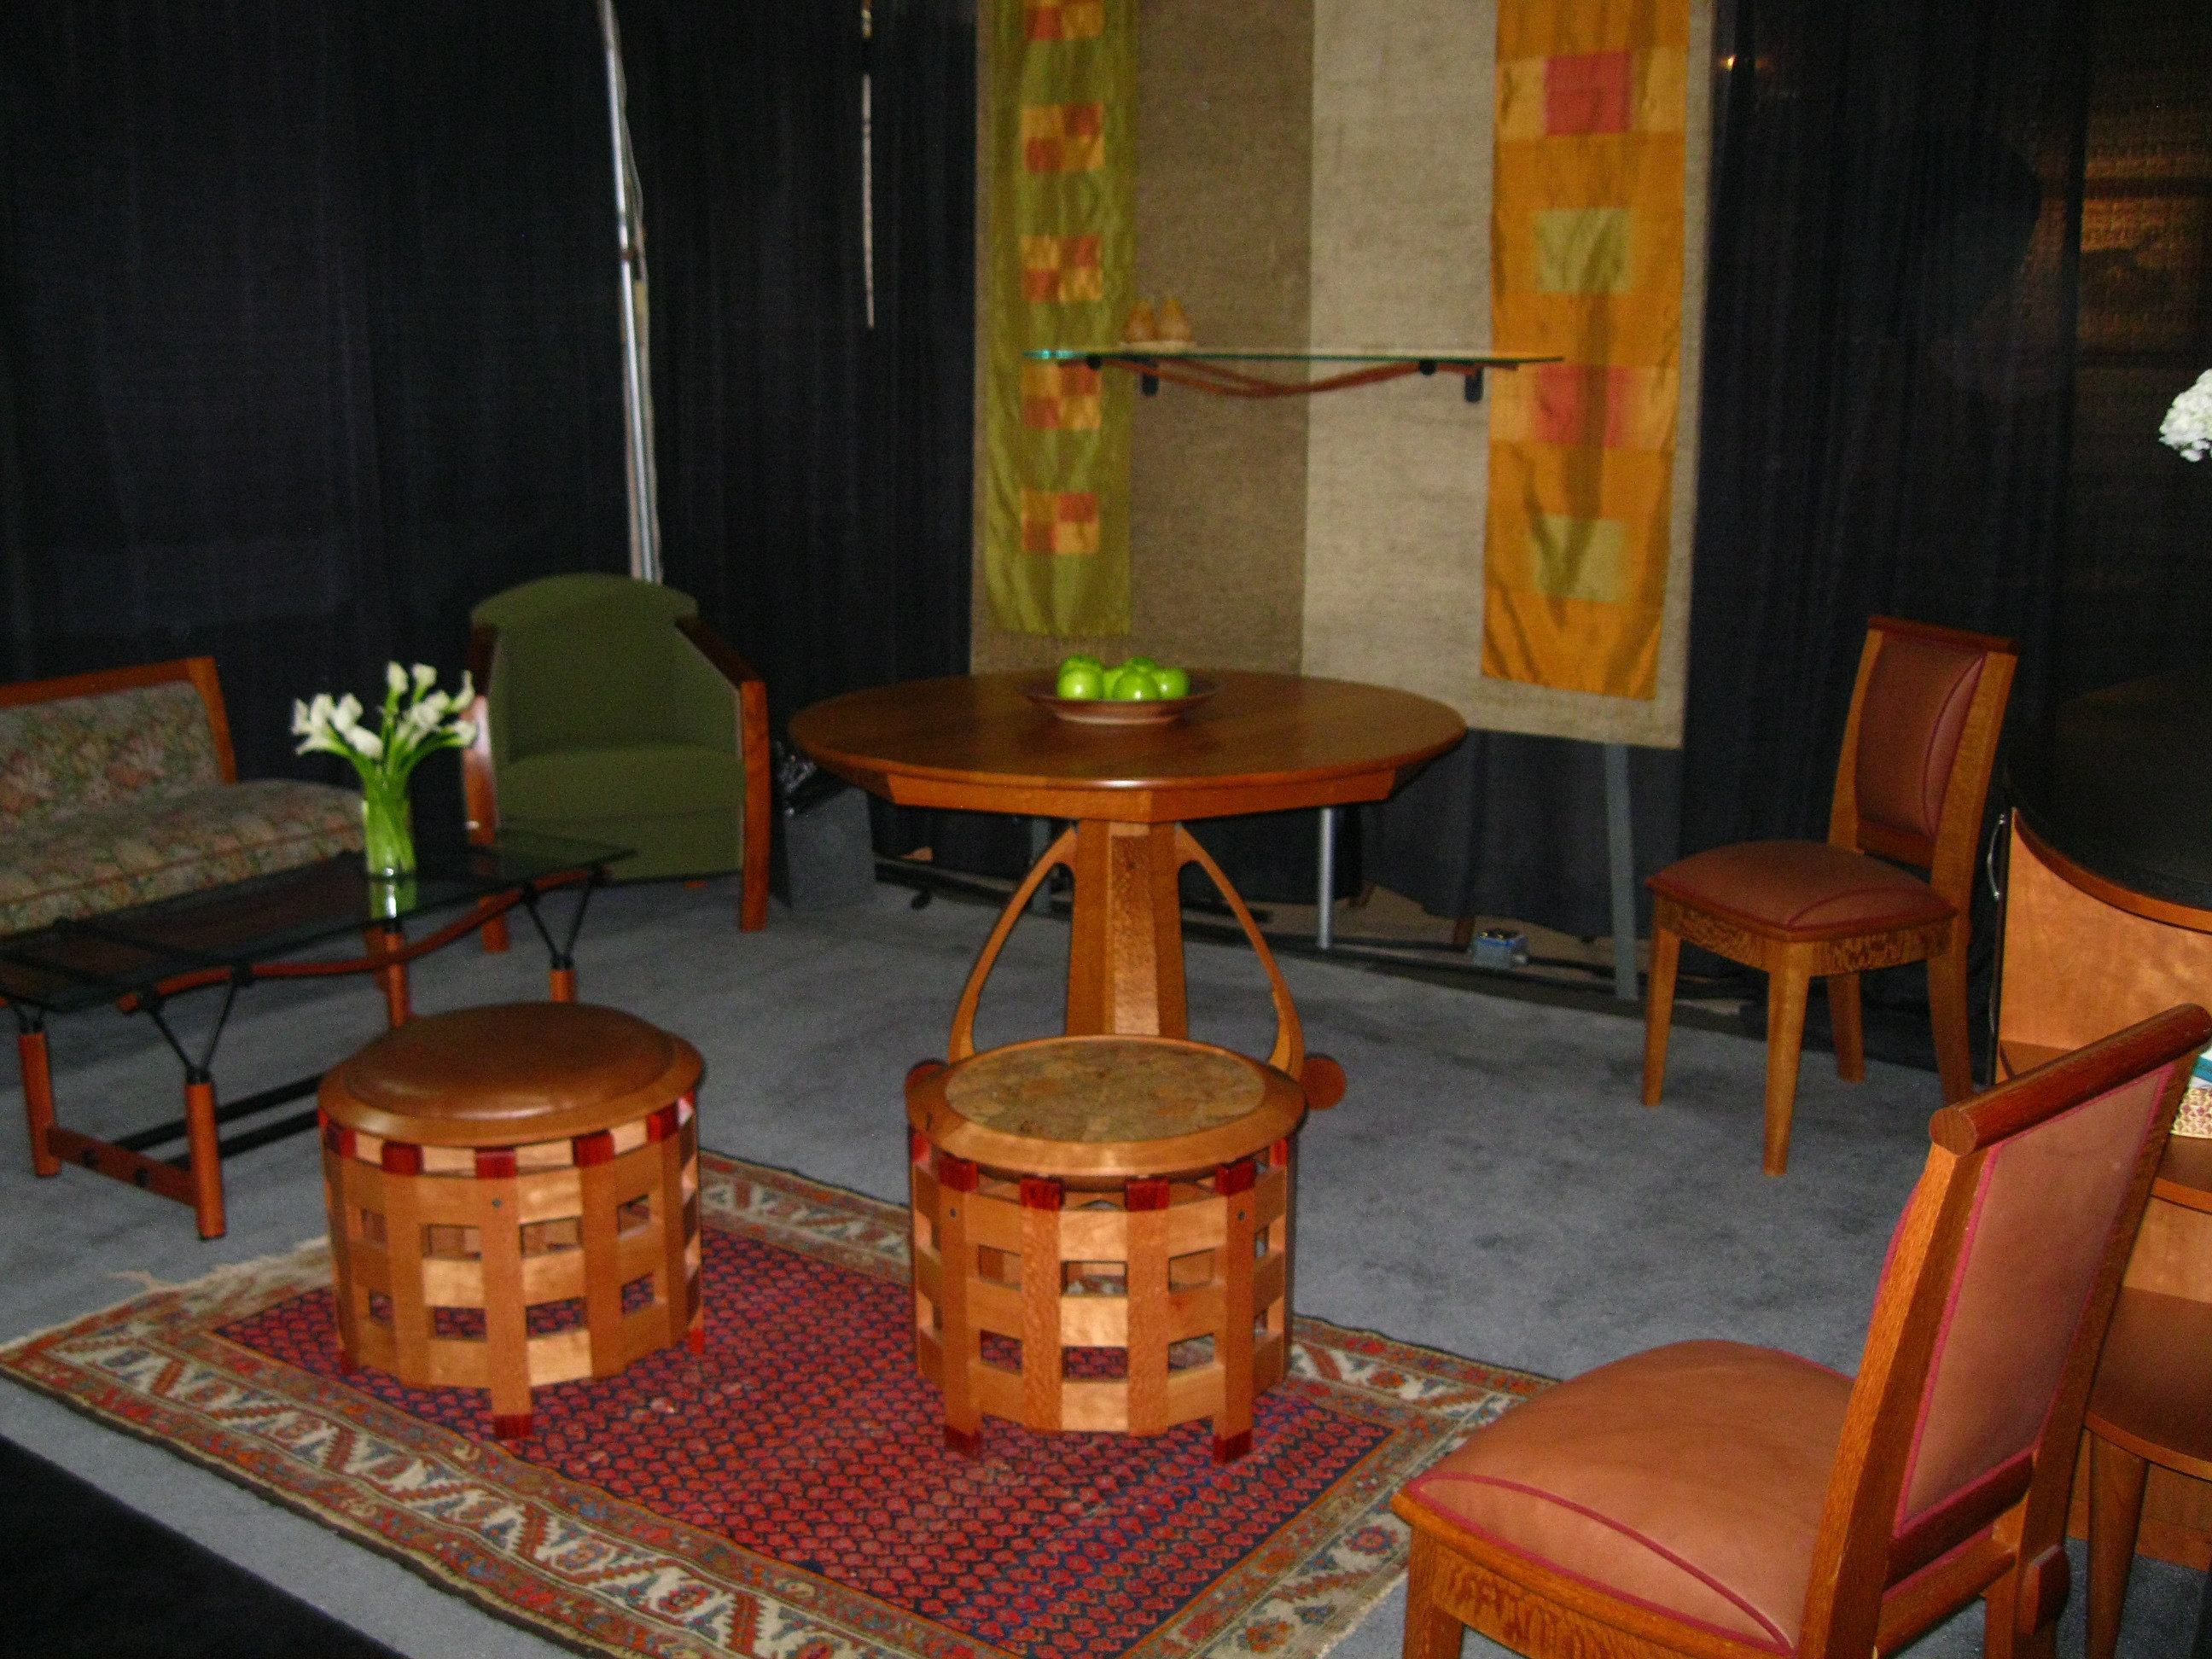 Philadelphia Furniture Show Img 0685 Jpg